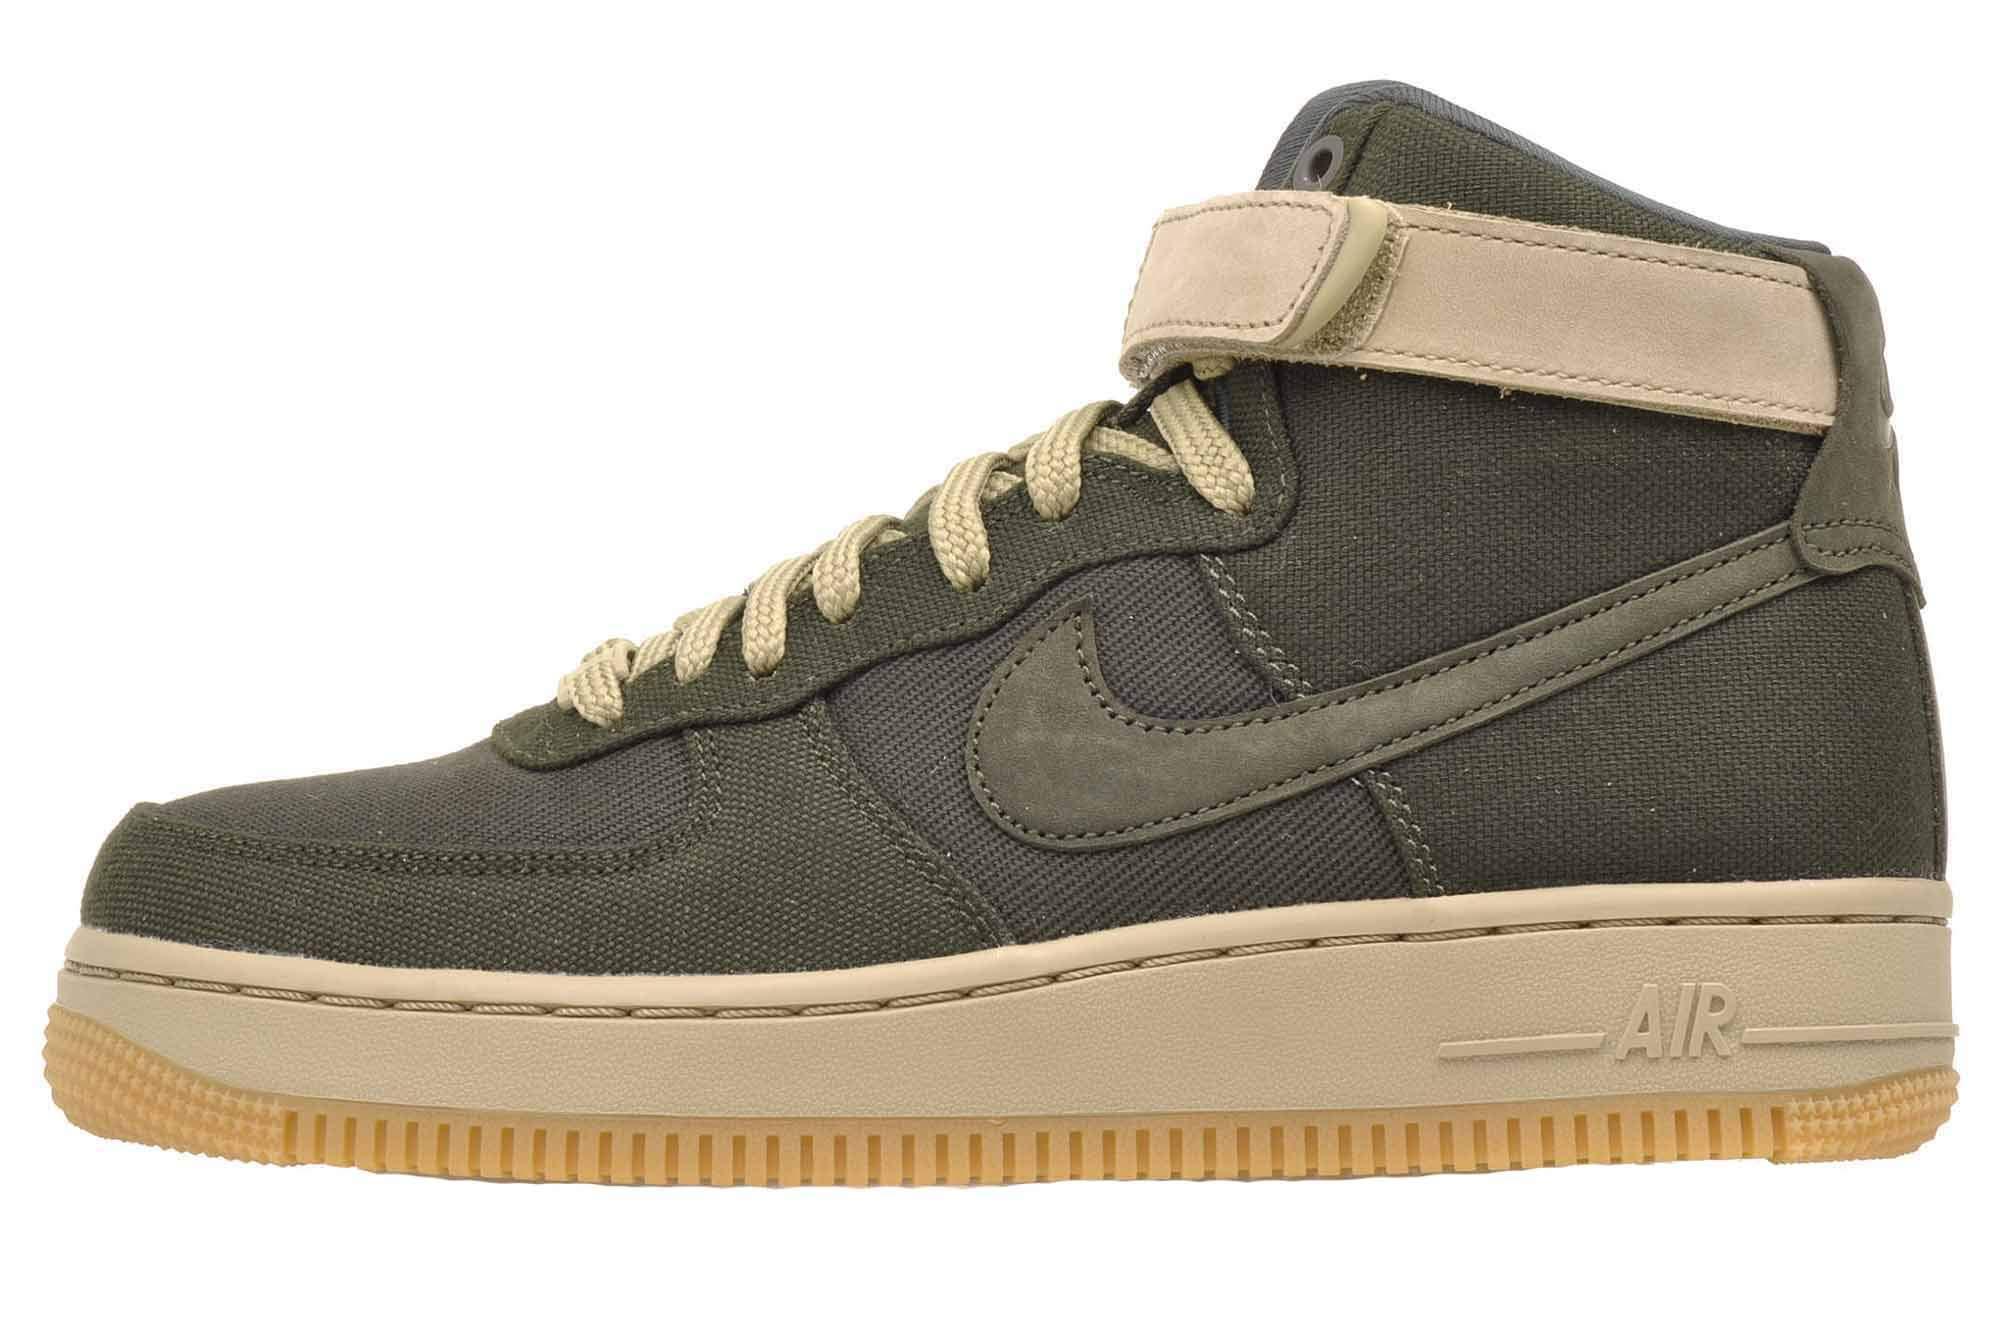 cheap for discount 5d625 5f44b Galleon - Nike Women s Air Force 1 Hi UT Basketball Shoes, AJ2775 300  Sequoia Sequoia-Neutral Olive (9 B(M) US)